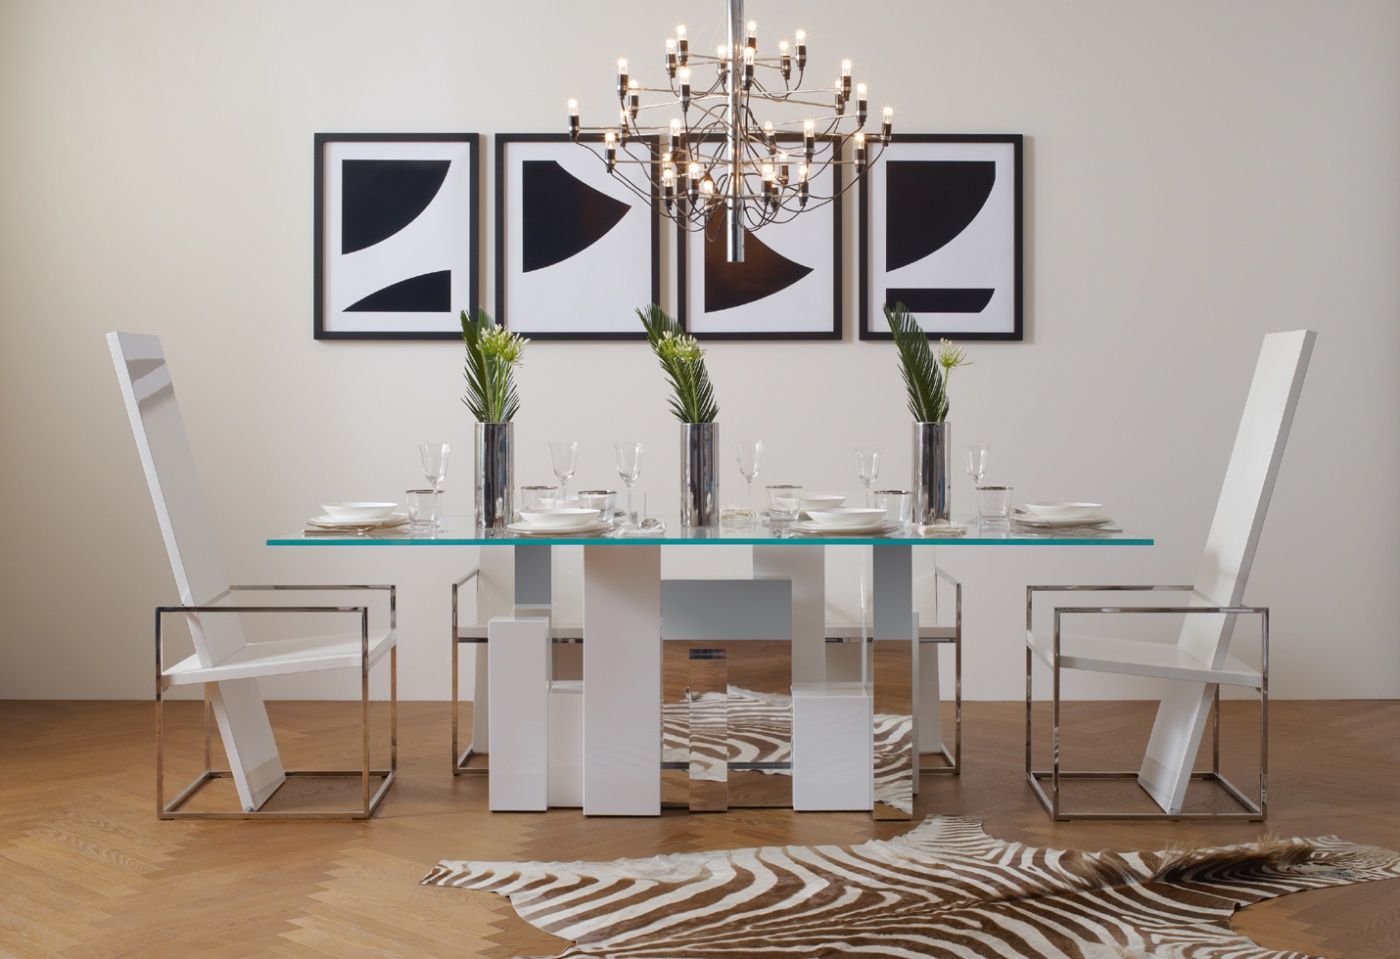 Emmemobili  City  H&h Dubai  Furniture  Dining Tables Gorgeous Dining Room Furniture Dubai Design Inspiration